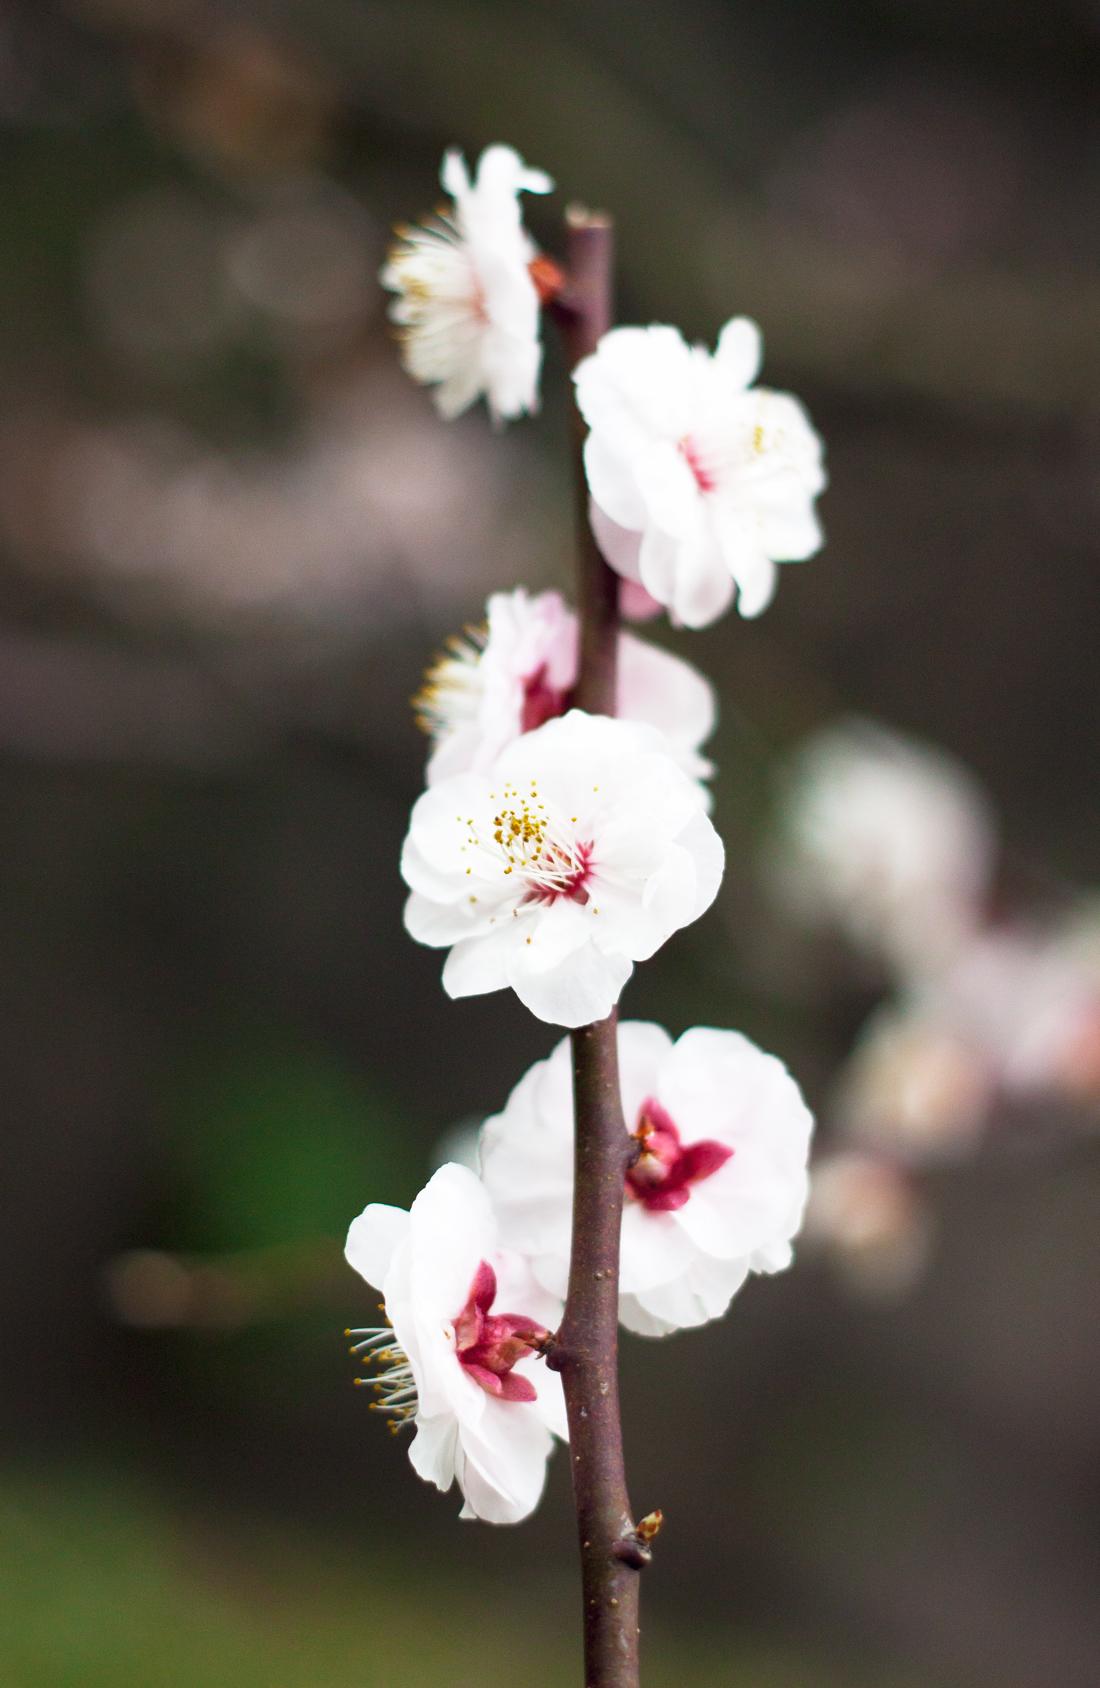 cherry blossom skirt, sakura, cherry blossoms, japan, tokyo spring, empire east gardens tokyo, leather jacket, quilted bag